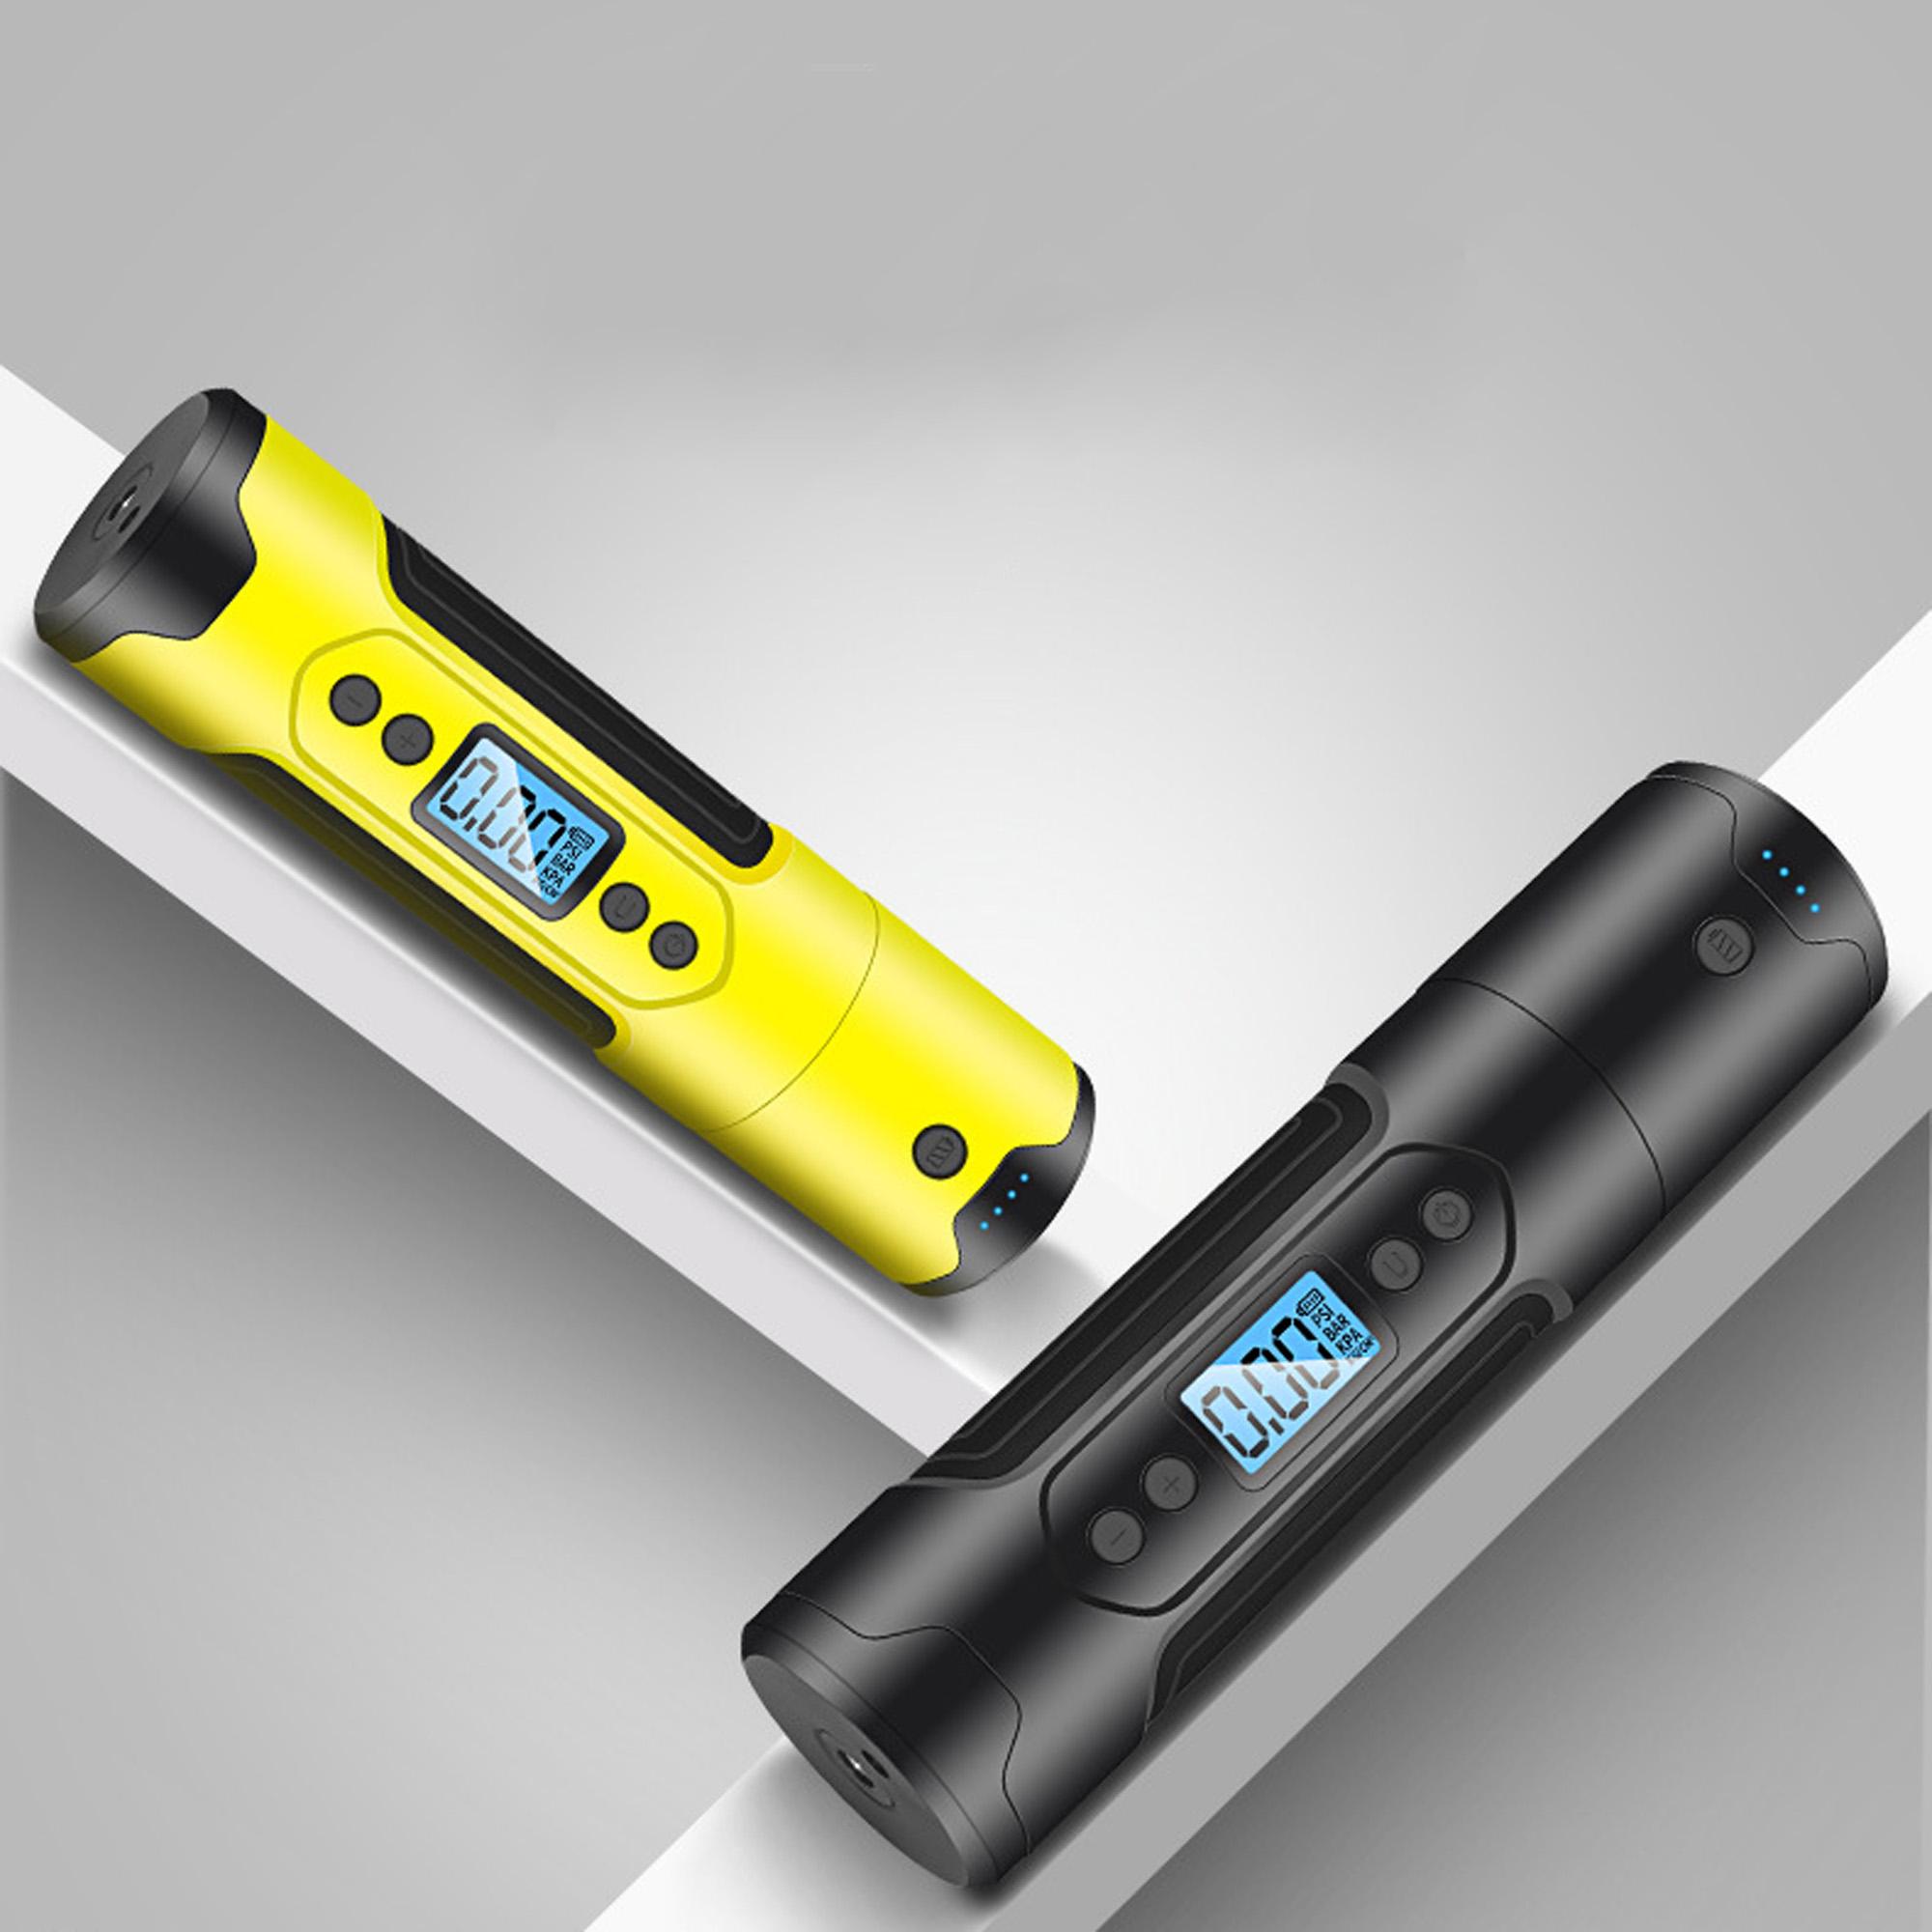 12V 150PSI Cordless Tyre Inflator Portable Compressor Digital Car Bike Air Pump